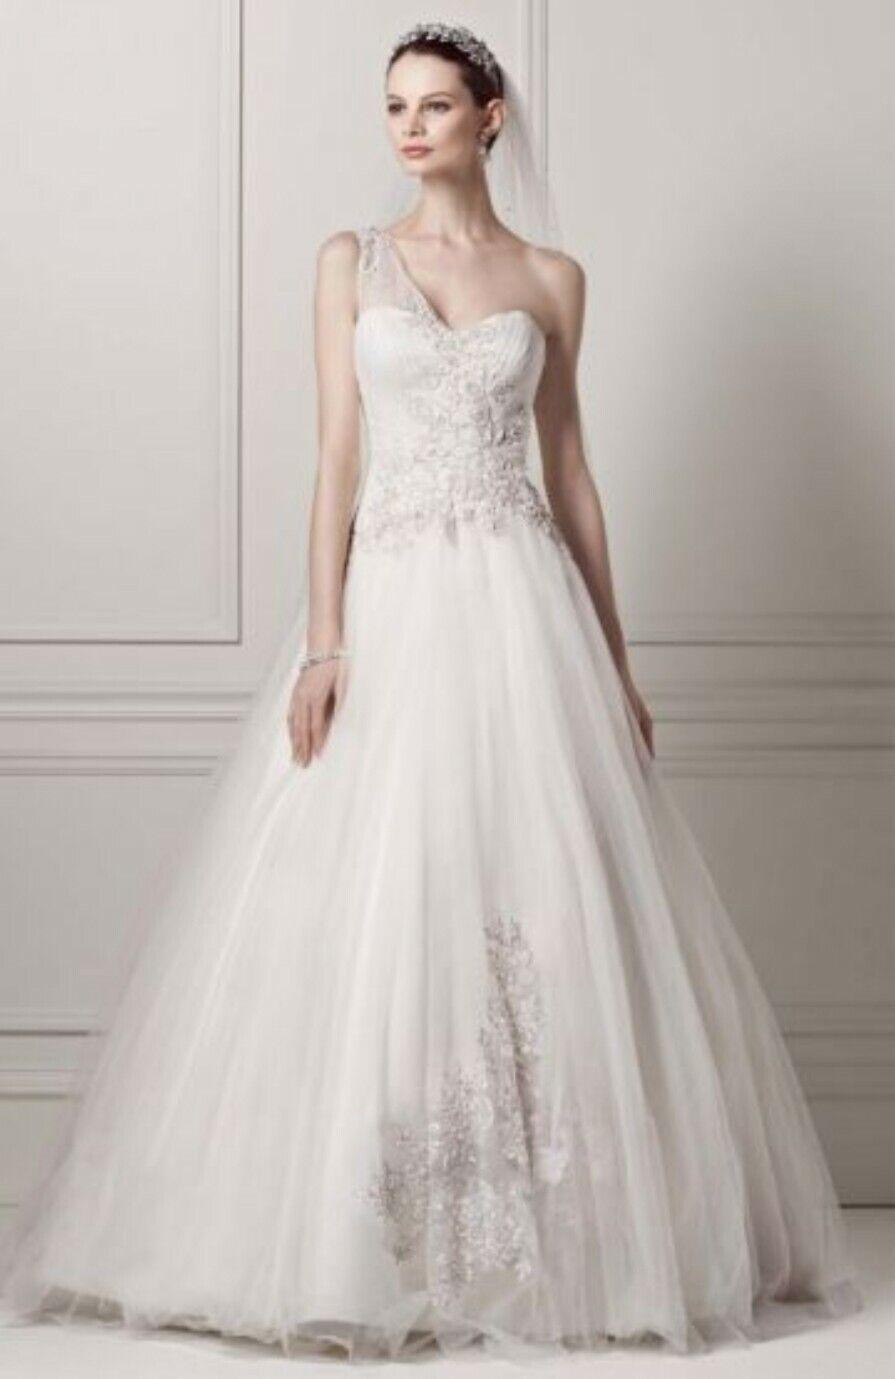 NWT - OLEG CASSINI / Tulle / One-shoulder / Bridal Wedding Dress Gown - Size 6